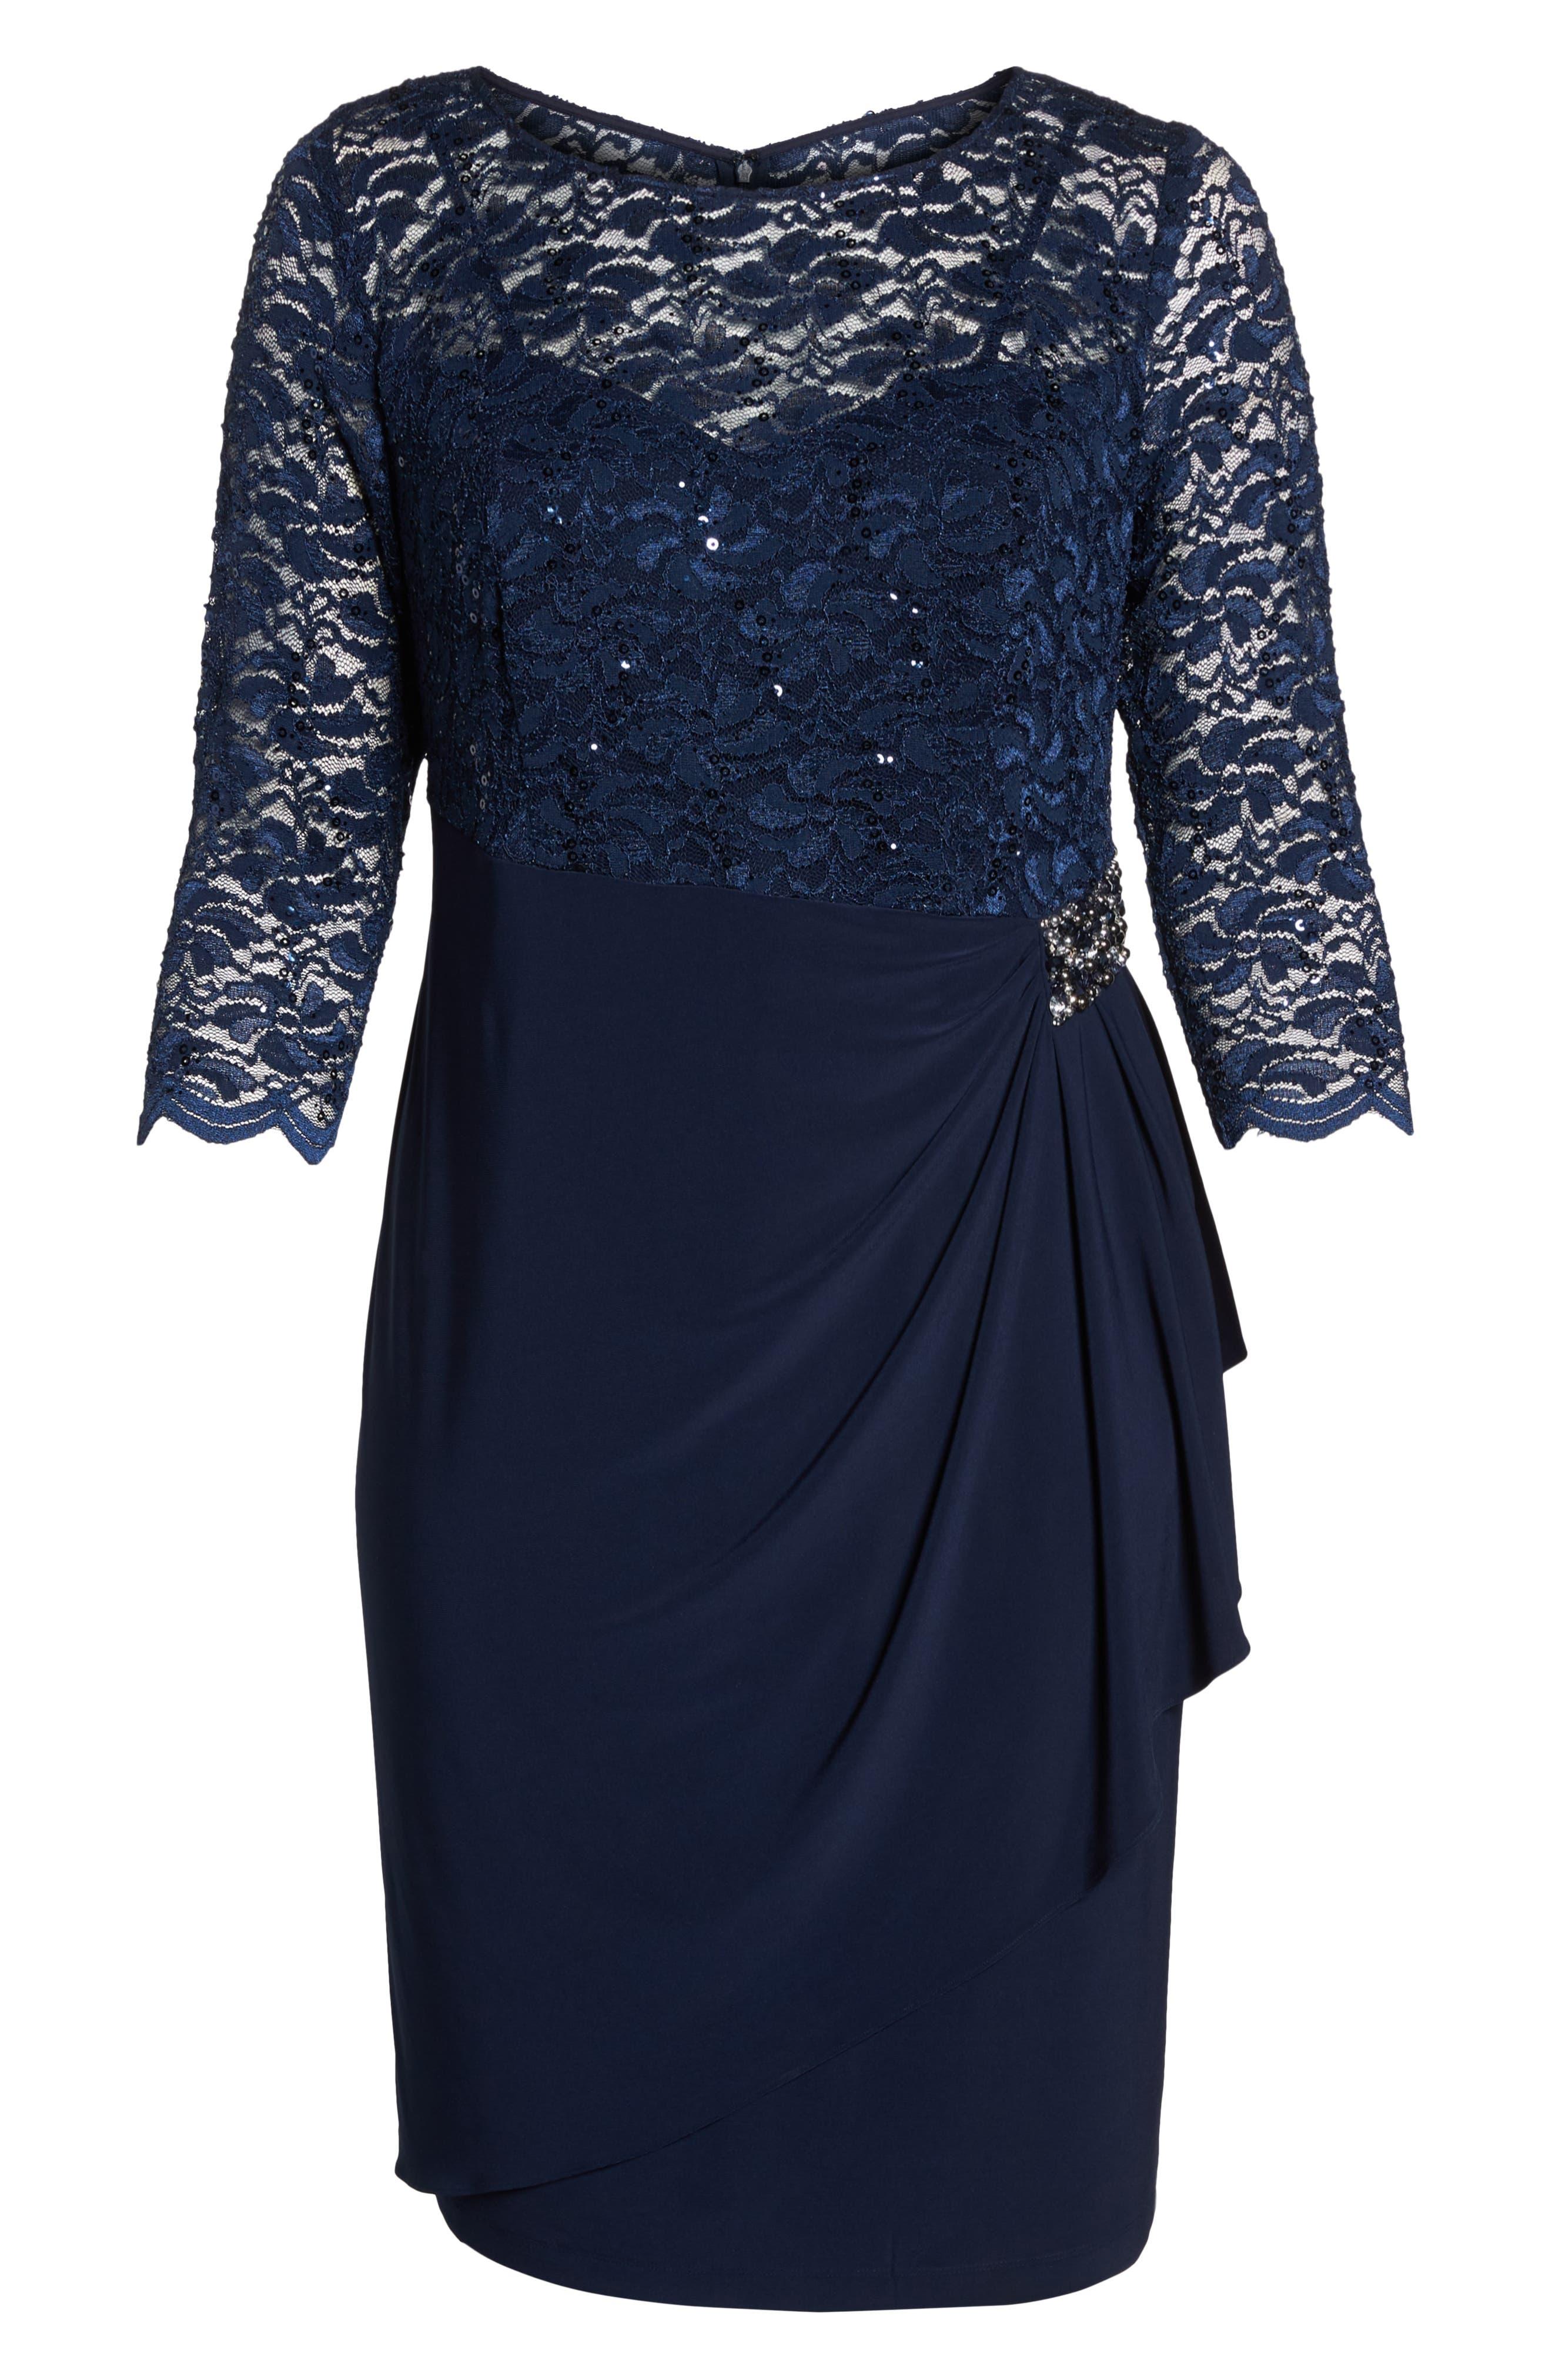 Embellished Ruffle Detail Shift Dress,                             Alternate thumbnail 6, color,                             410